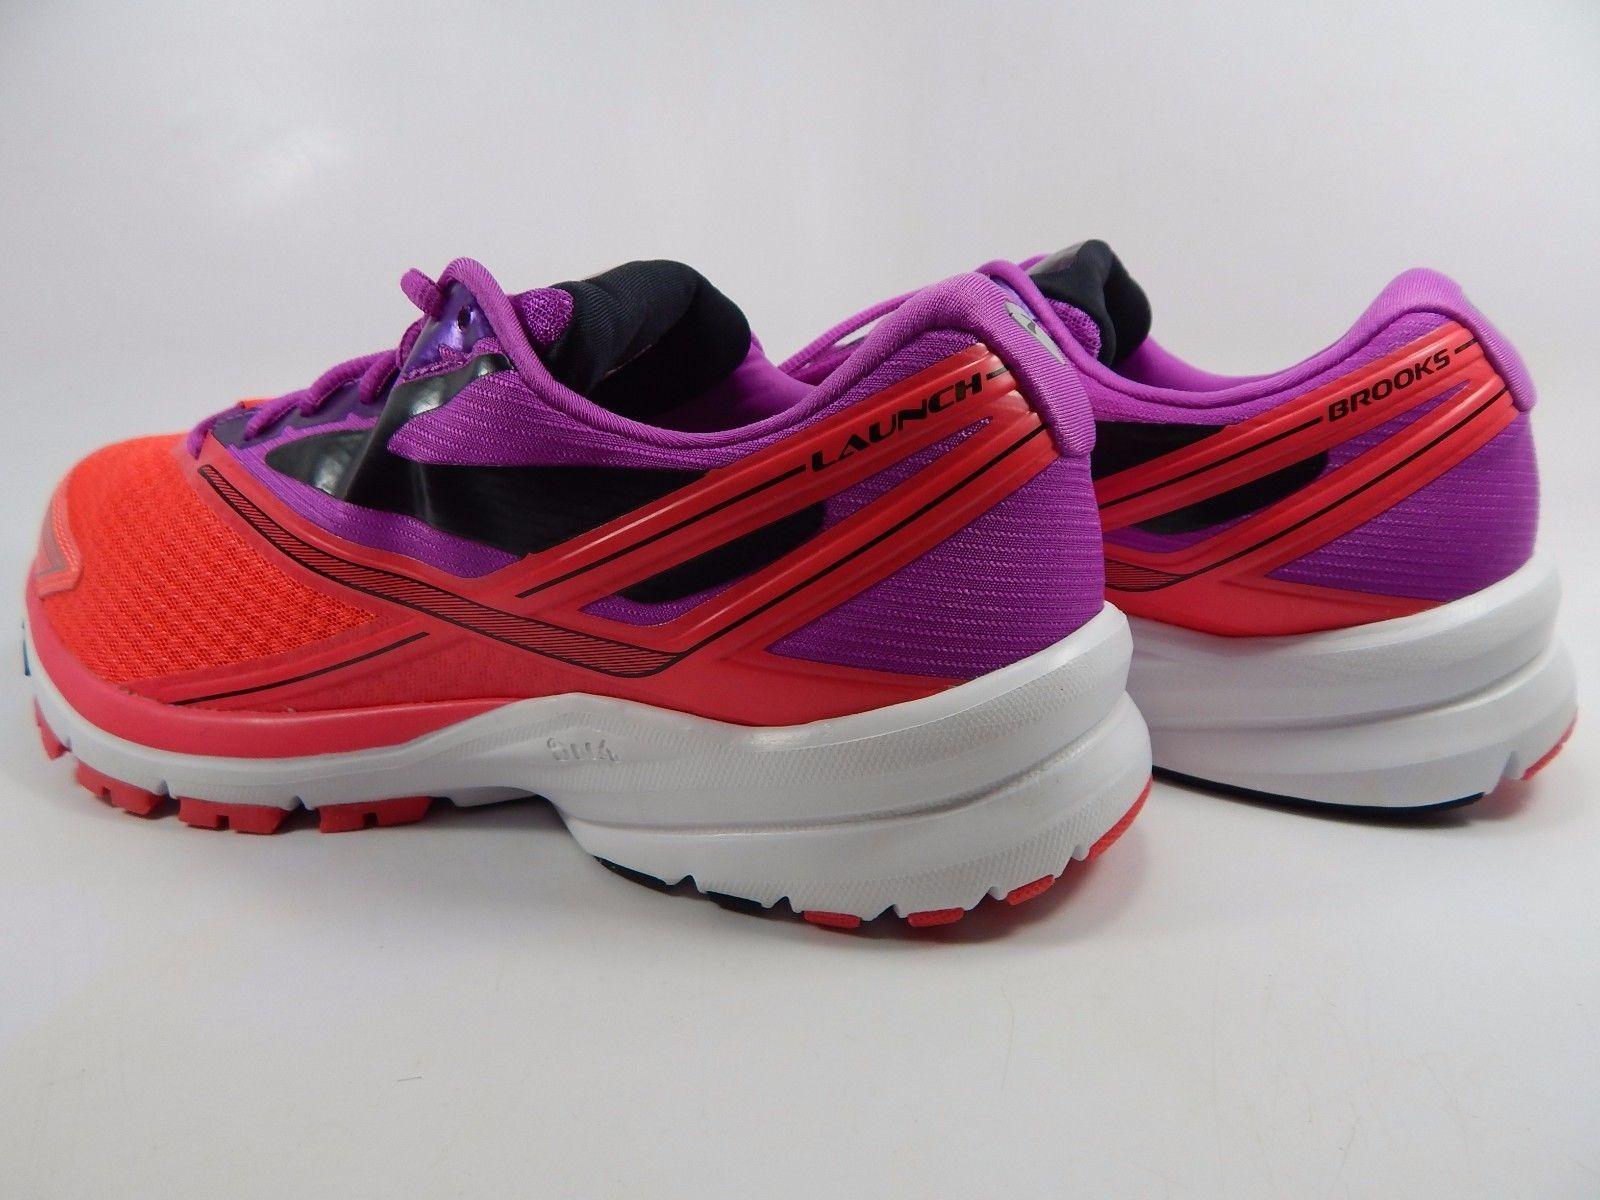 Brooks Launch 4 Women's Running Shoes Size US 11 M (B) EU 43 Pink 1202341B541